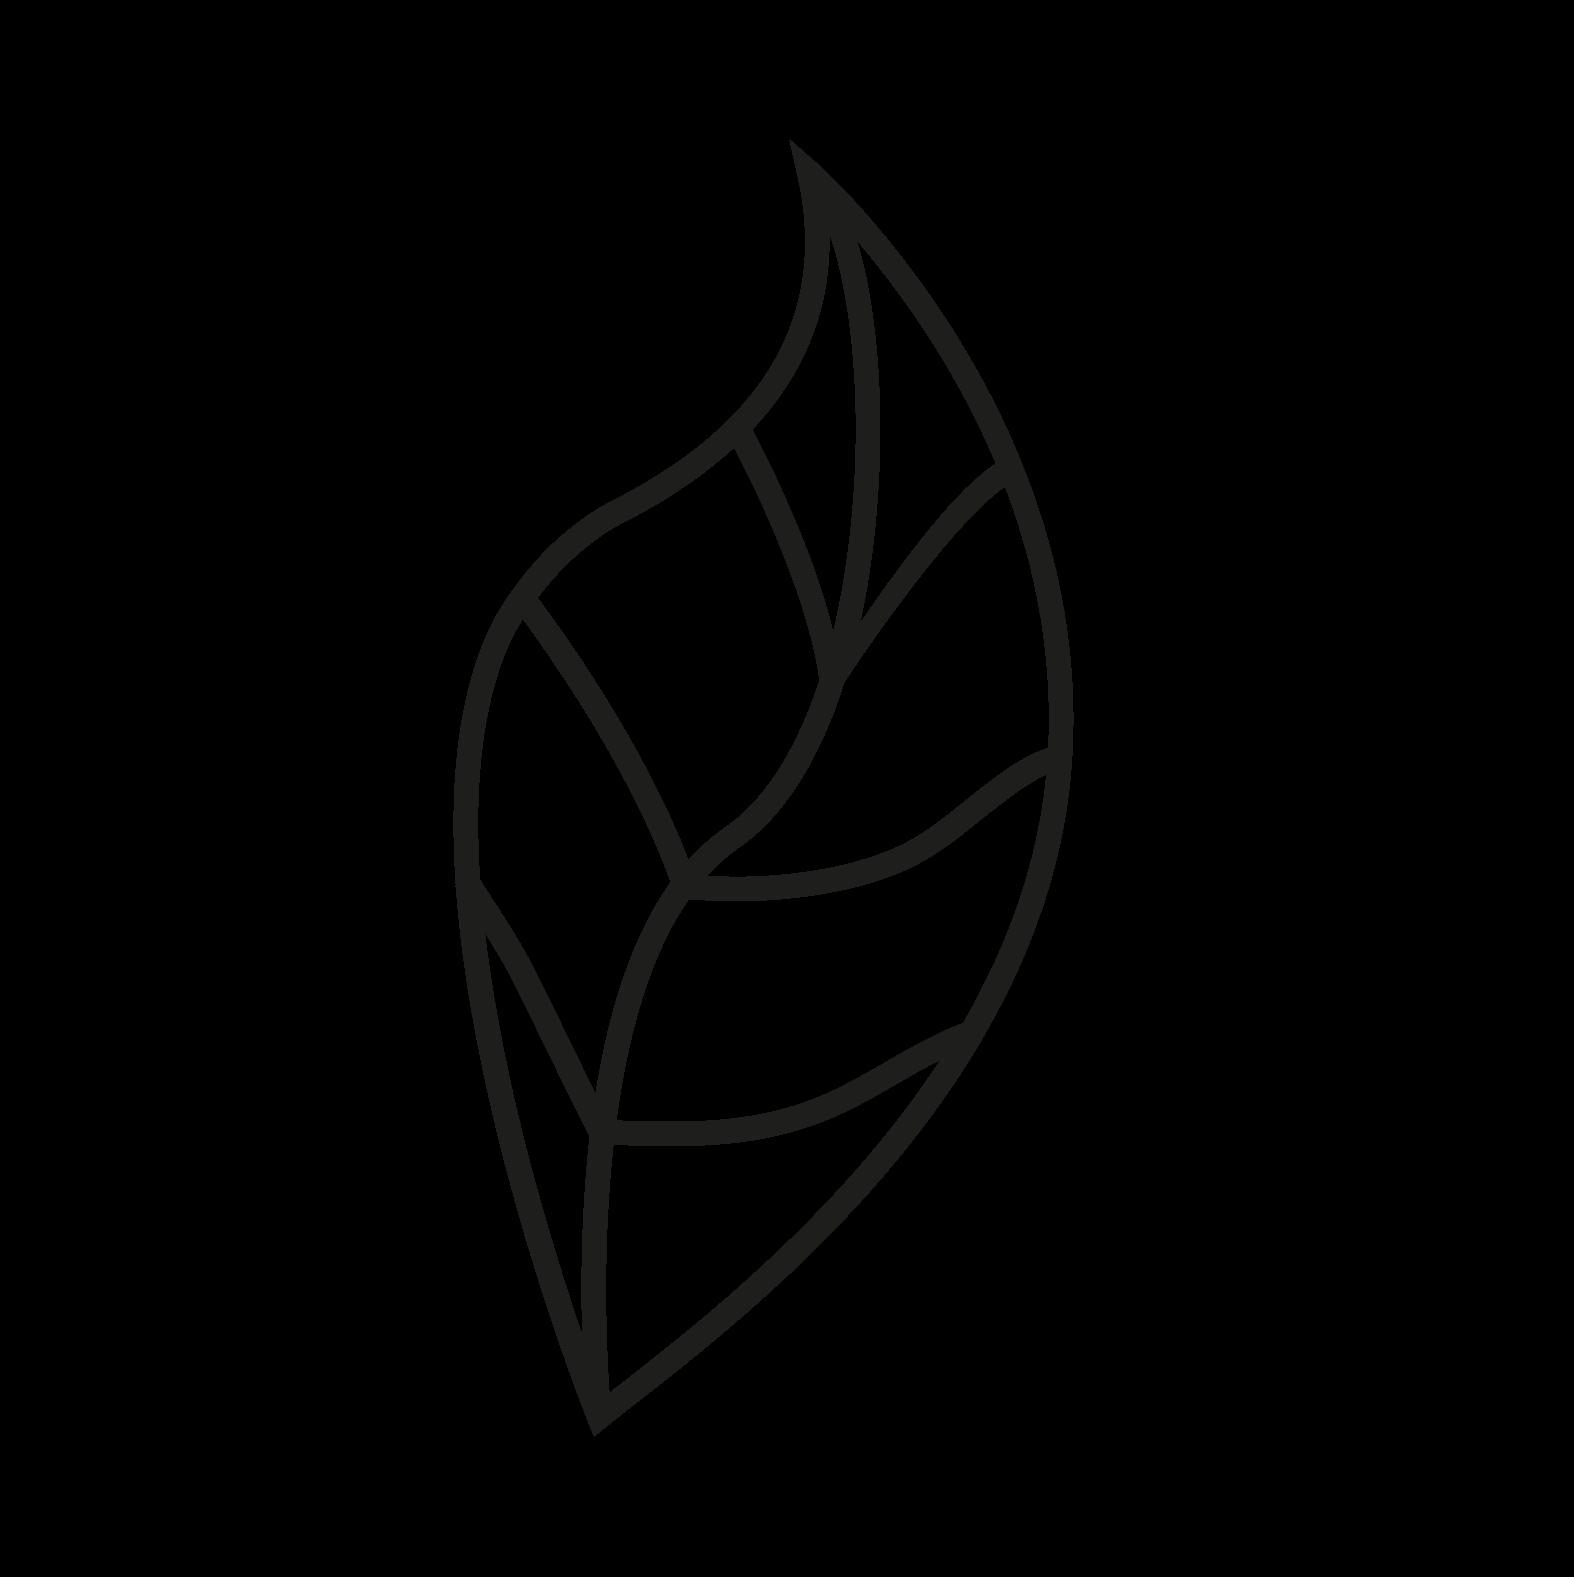 logo-vitality-leaf-black.png